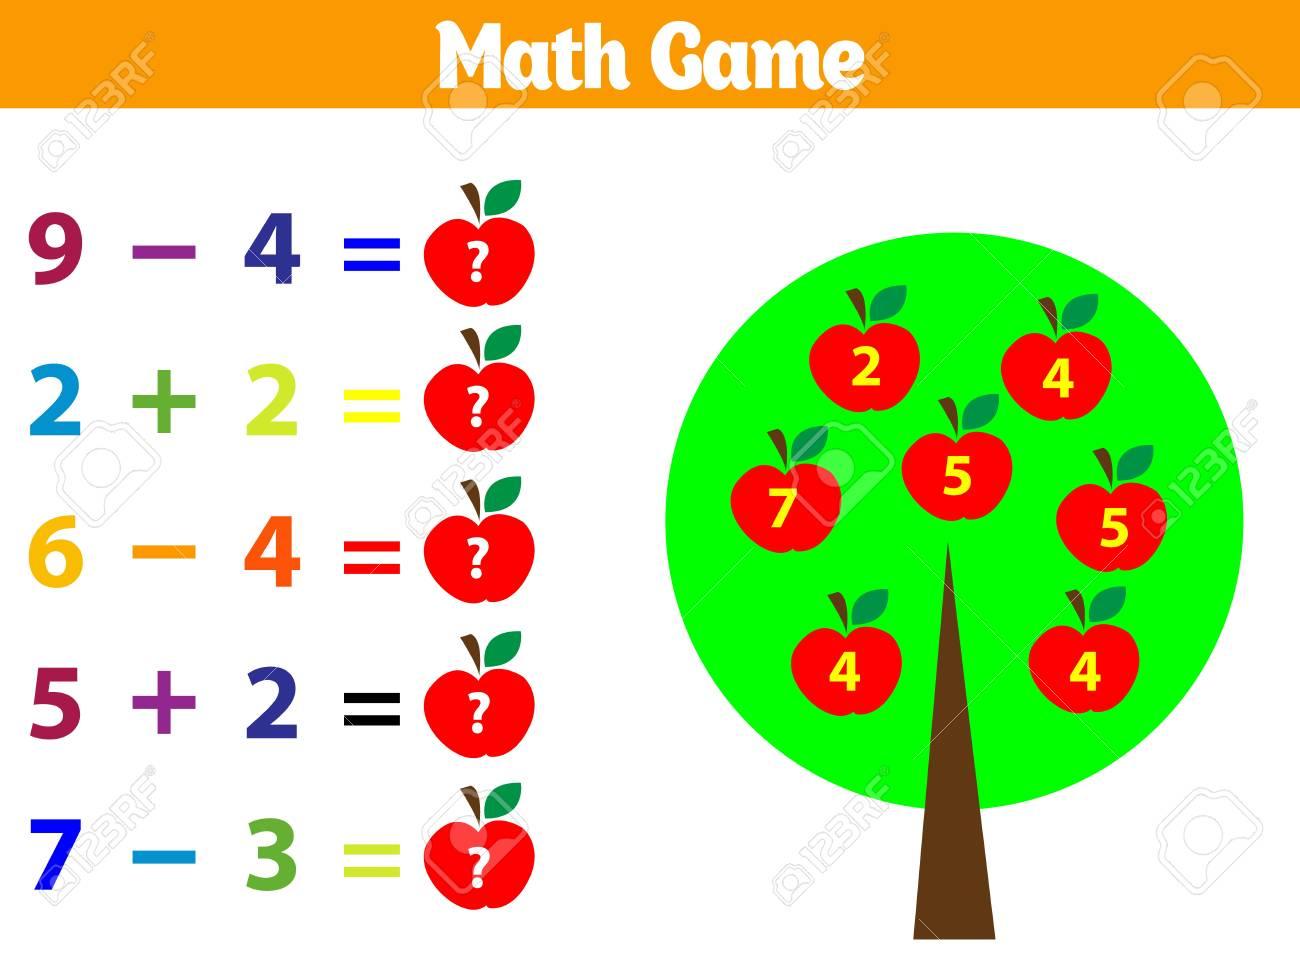 Mathematics educational game for children. Vector illustration. - 127128967